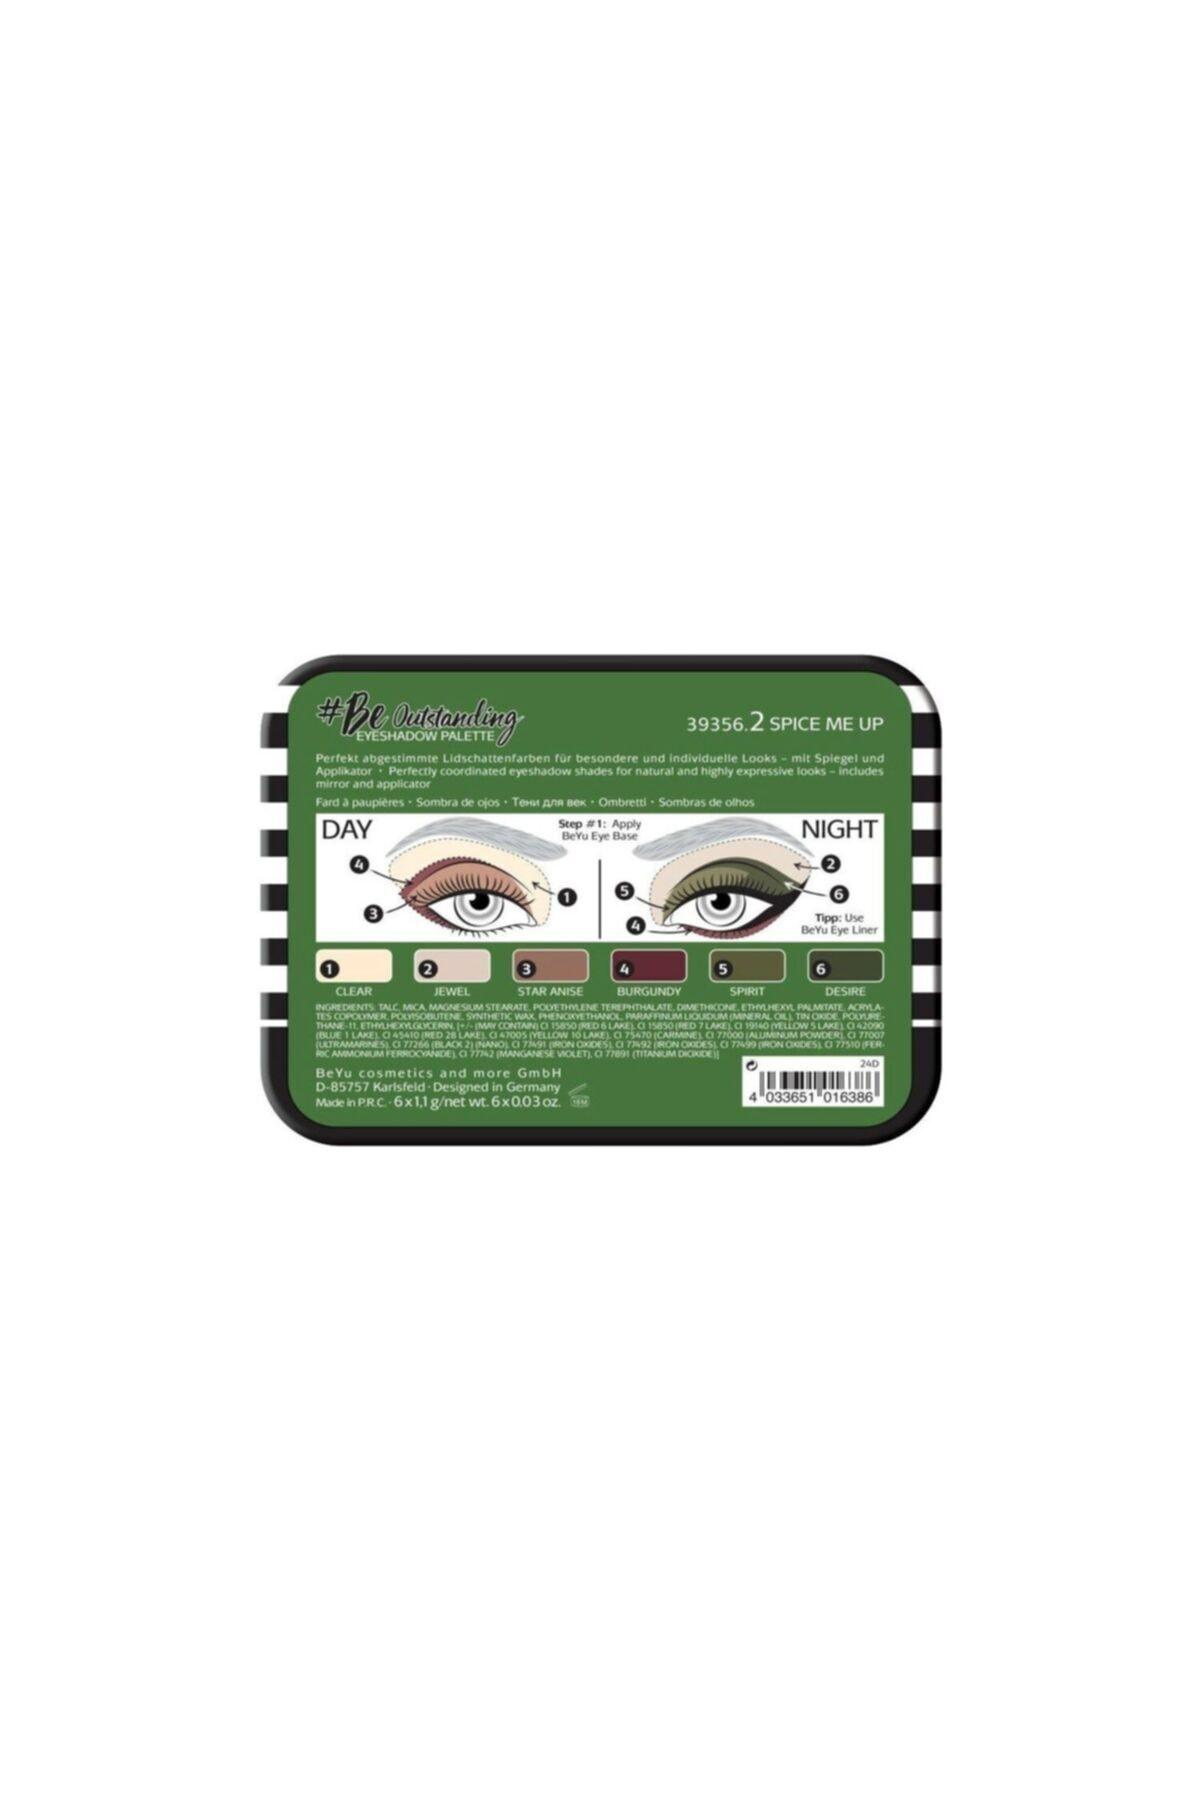 Beyu Be Outstanding Eyeshadow Palette Göz Farı Paleti 2 2